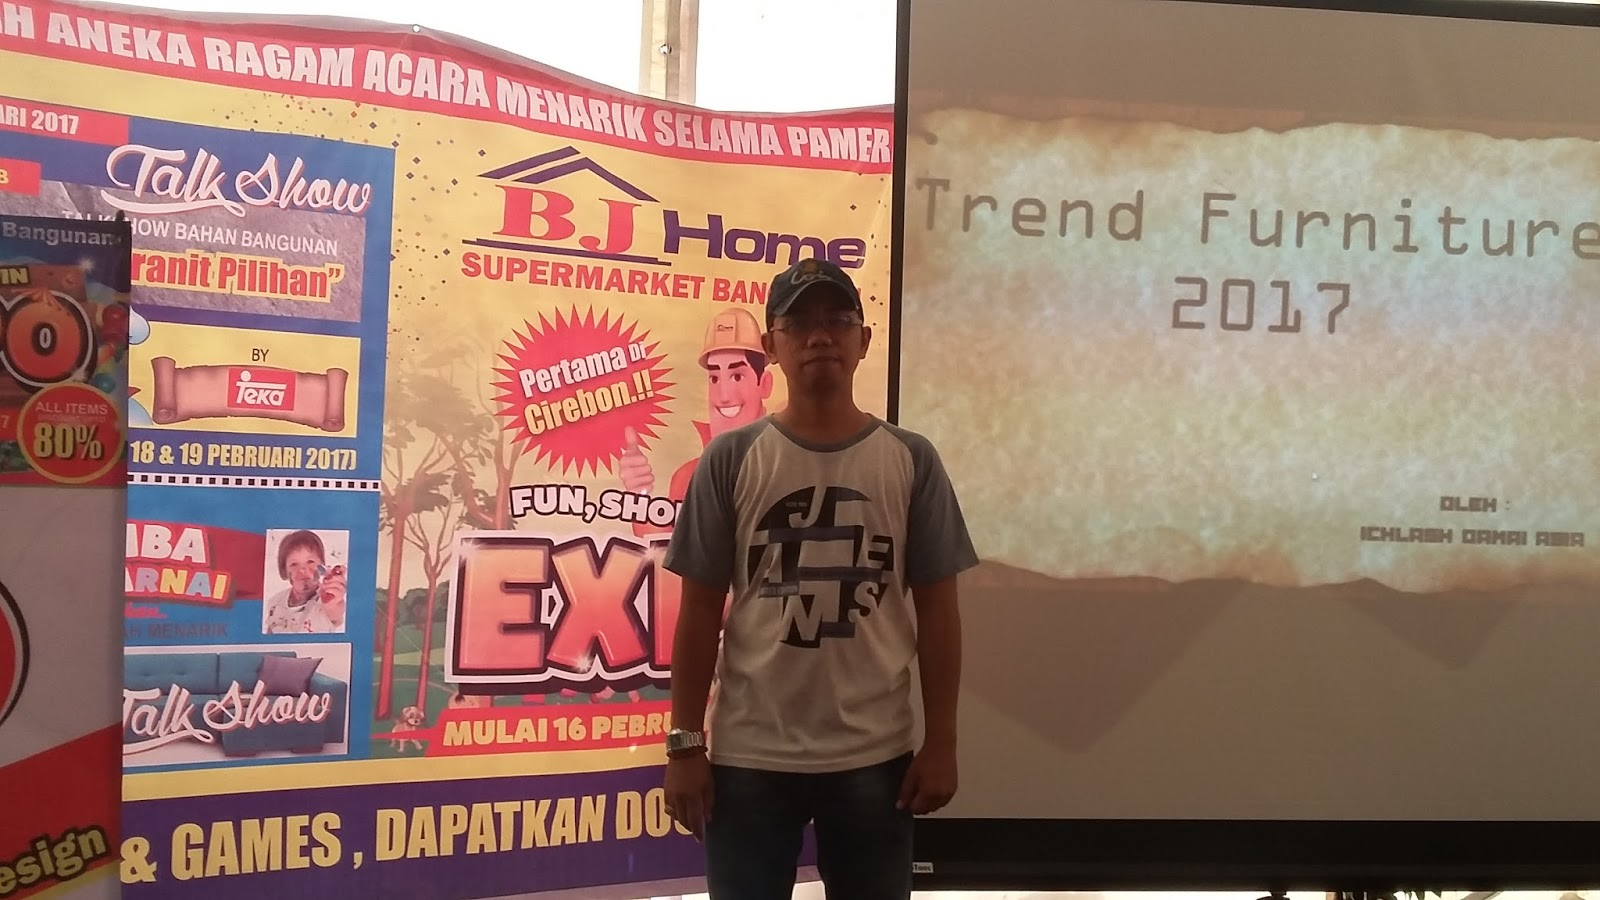 Idesign Arsitektur Talk Show Tren Furniture 2017 Di Bj Home Cirebon